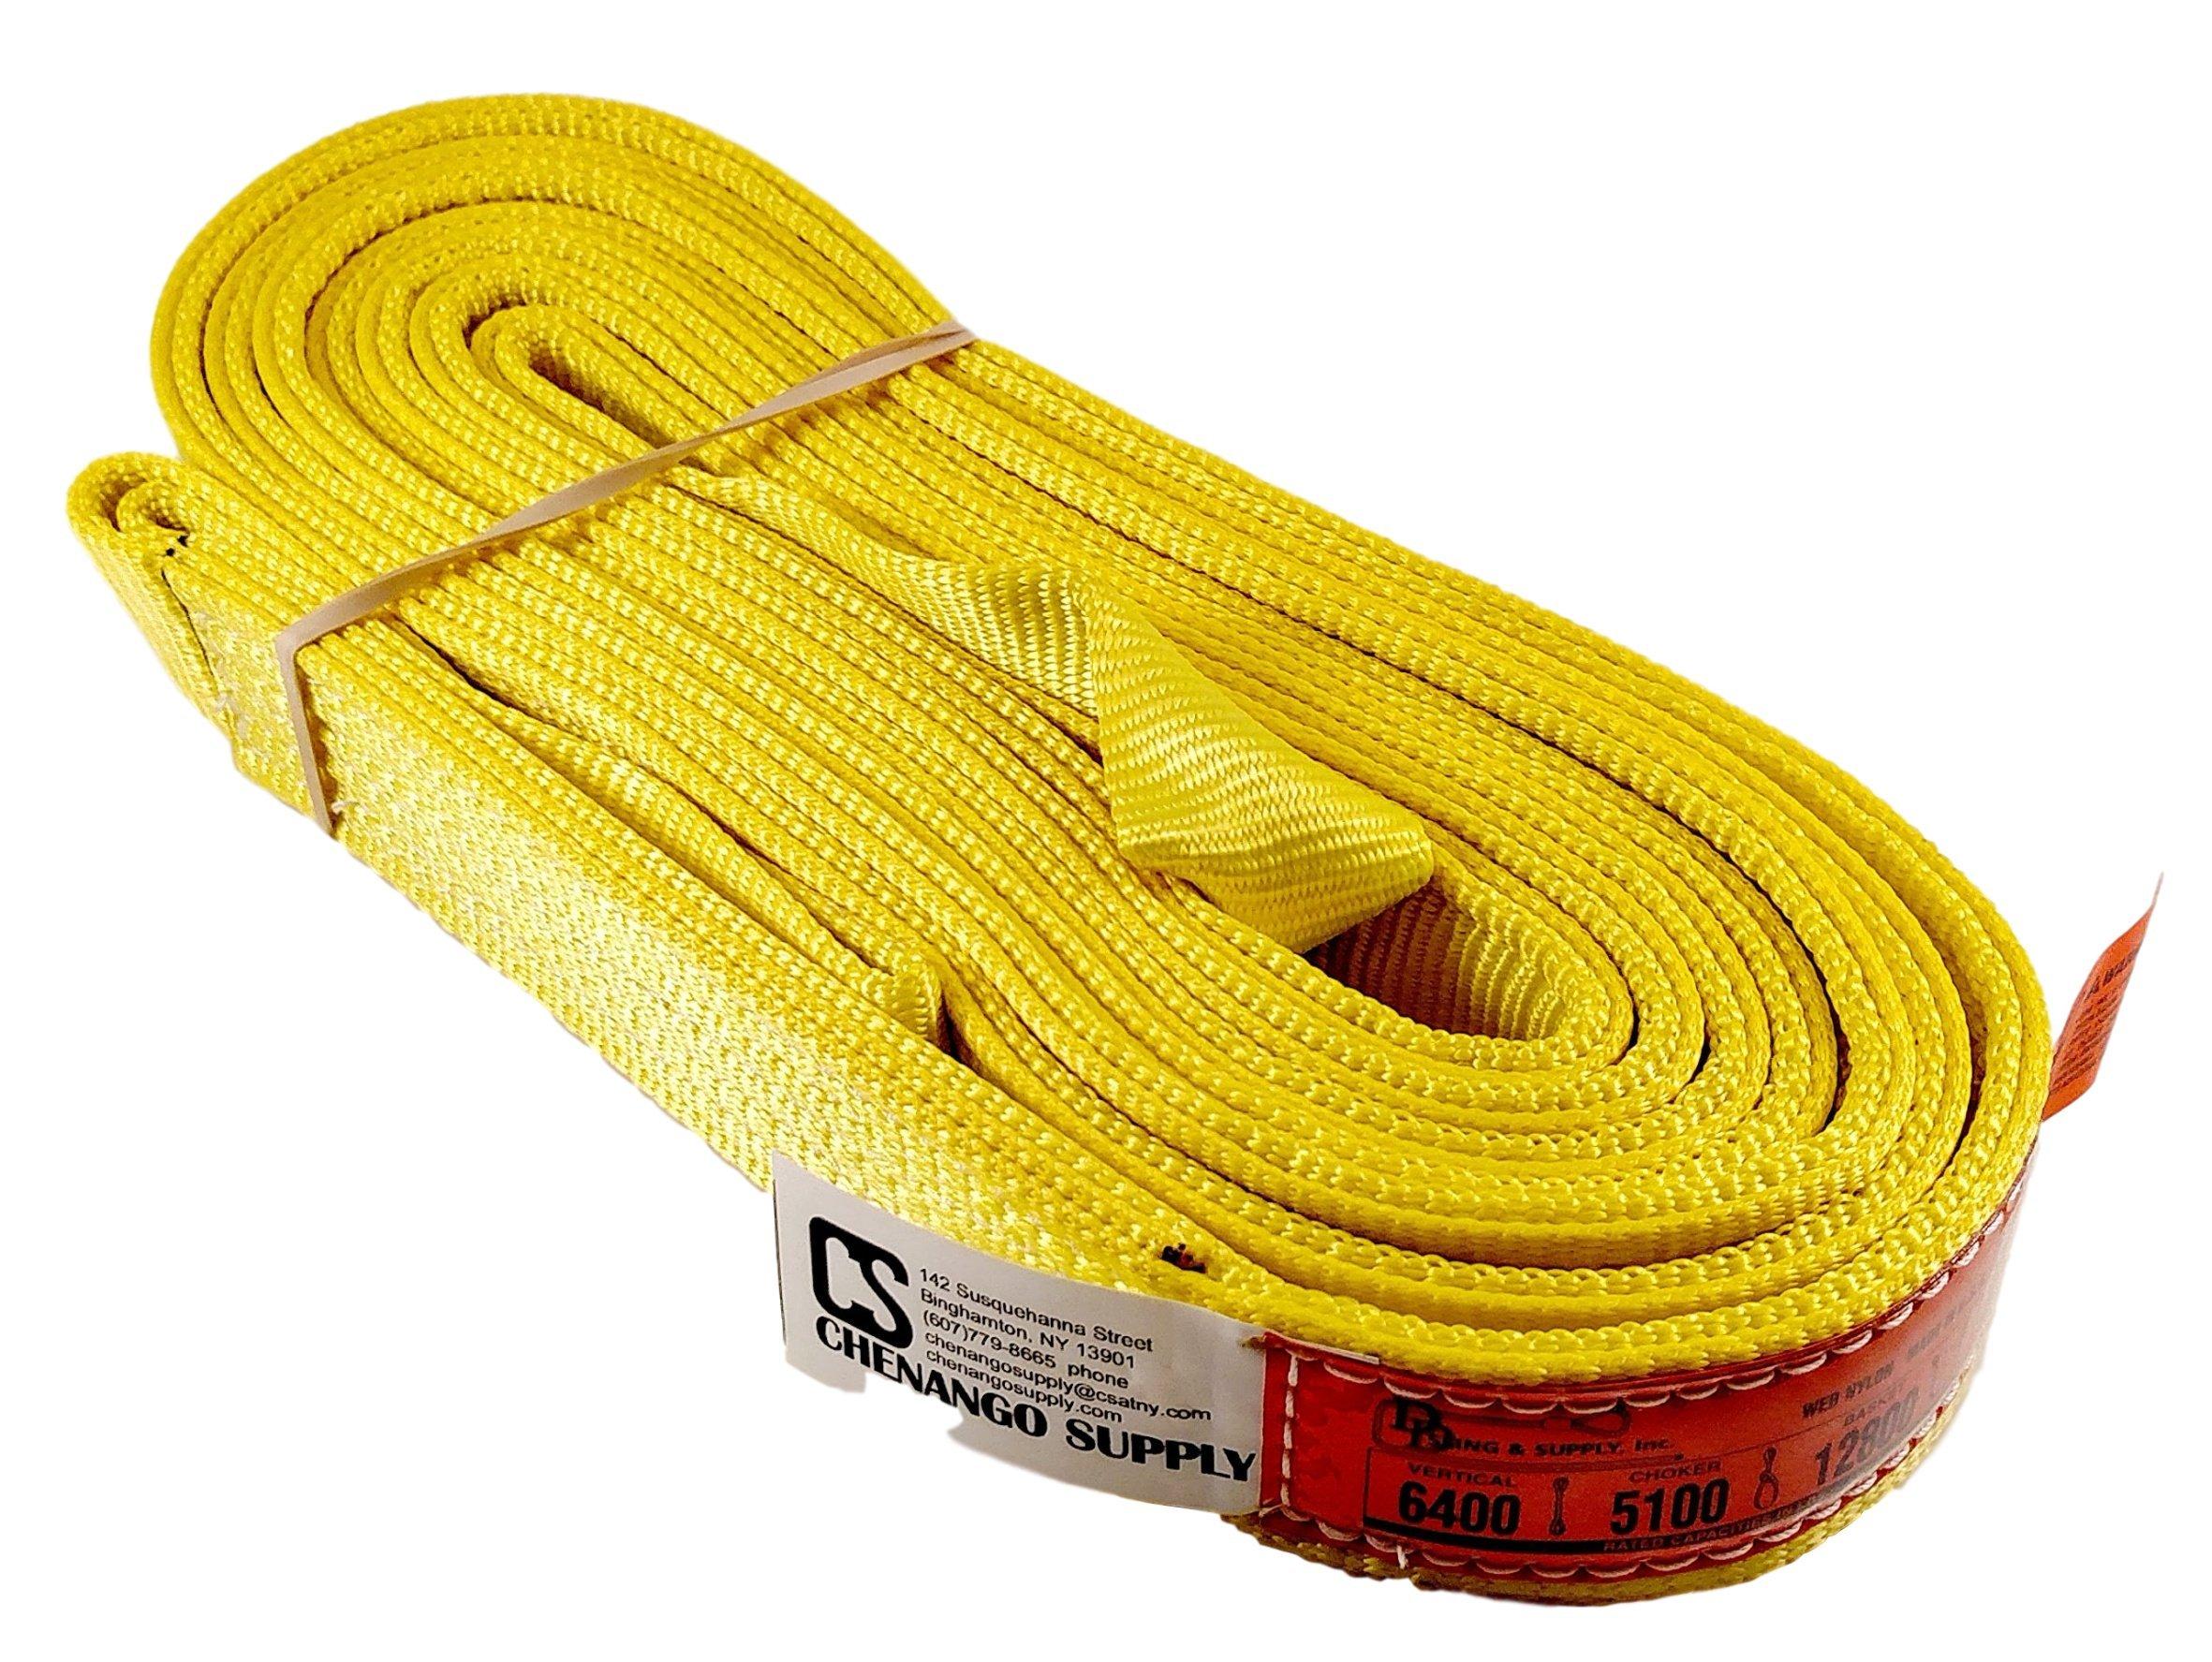 DD Sling (USA Made). 2'' wide X (4' to 20' lengths) in Listing! 2 Ply Twisted Eye, Nylon Lifting Slings, Eye & Eye, Heavy Duty (900 webbing), 6,400 lbs Vertical, 5,100 Choker, 12,800 Basket Load Capacity (2inX20ft)